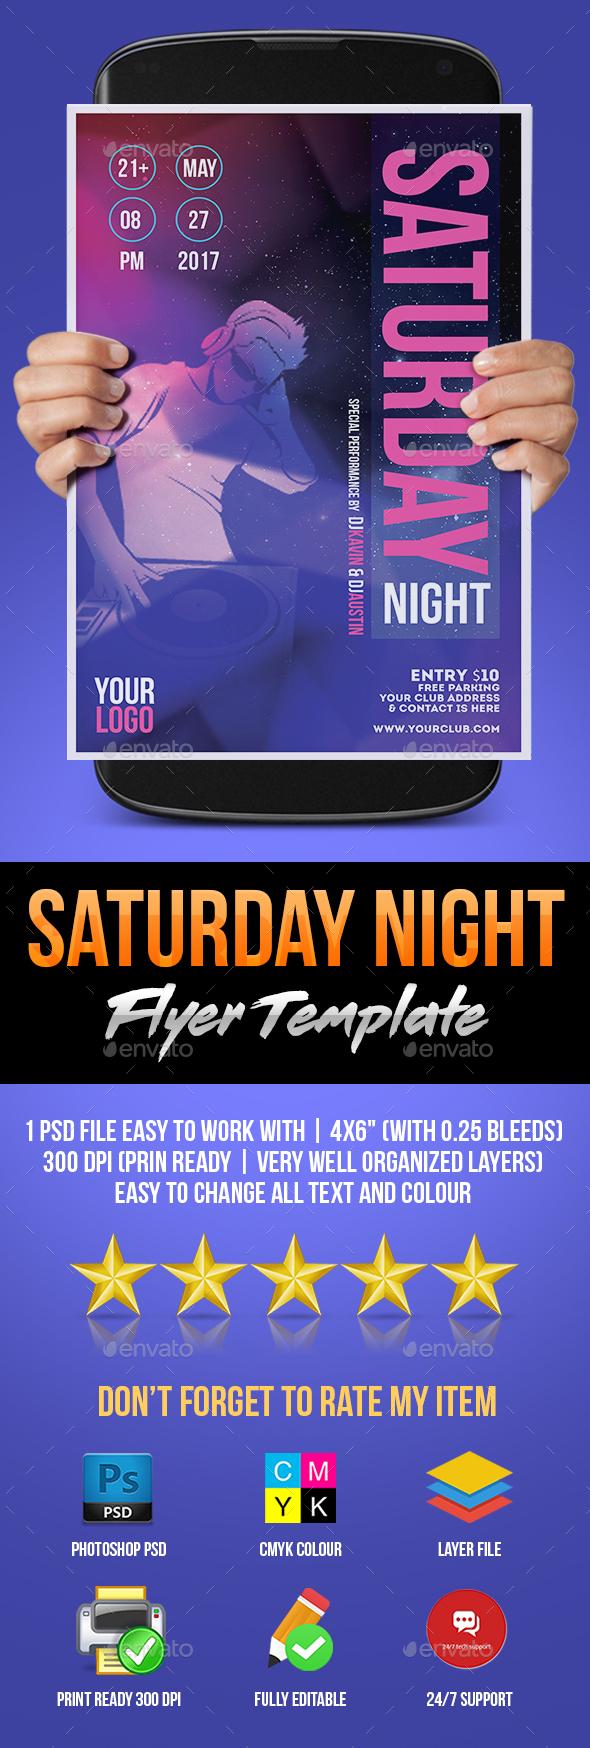 Saturday Night Flyer - Flyers Print Templates